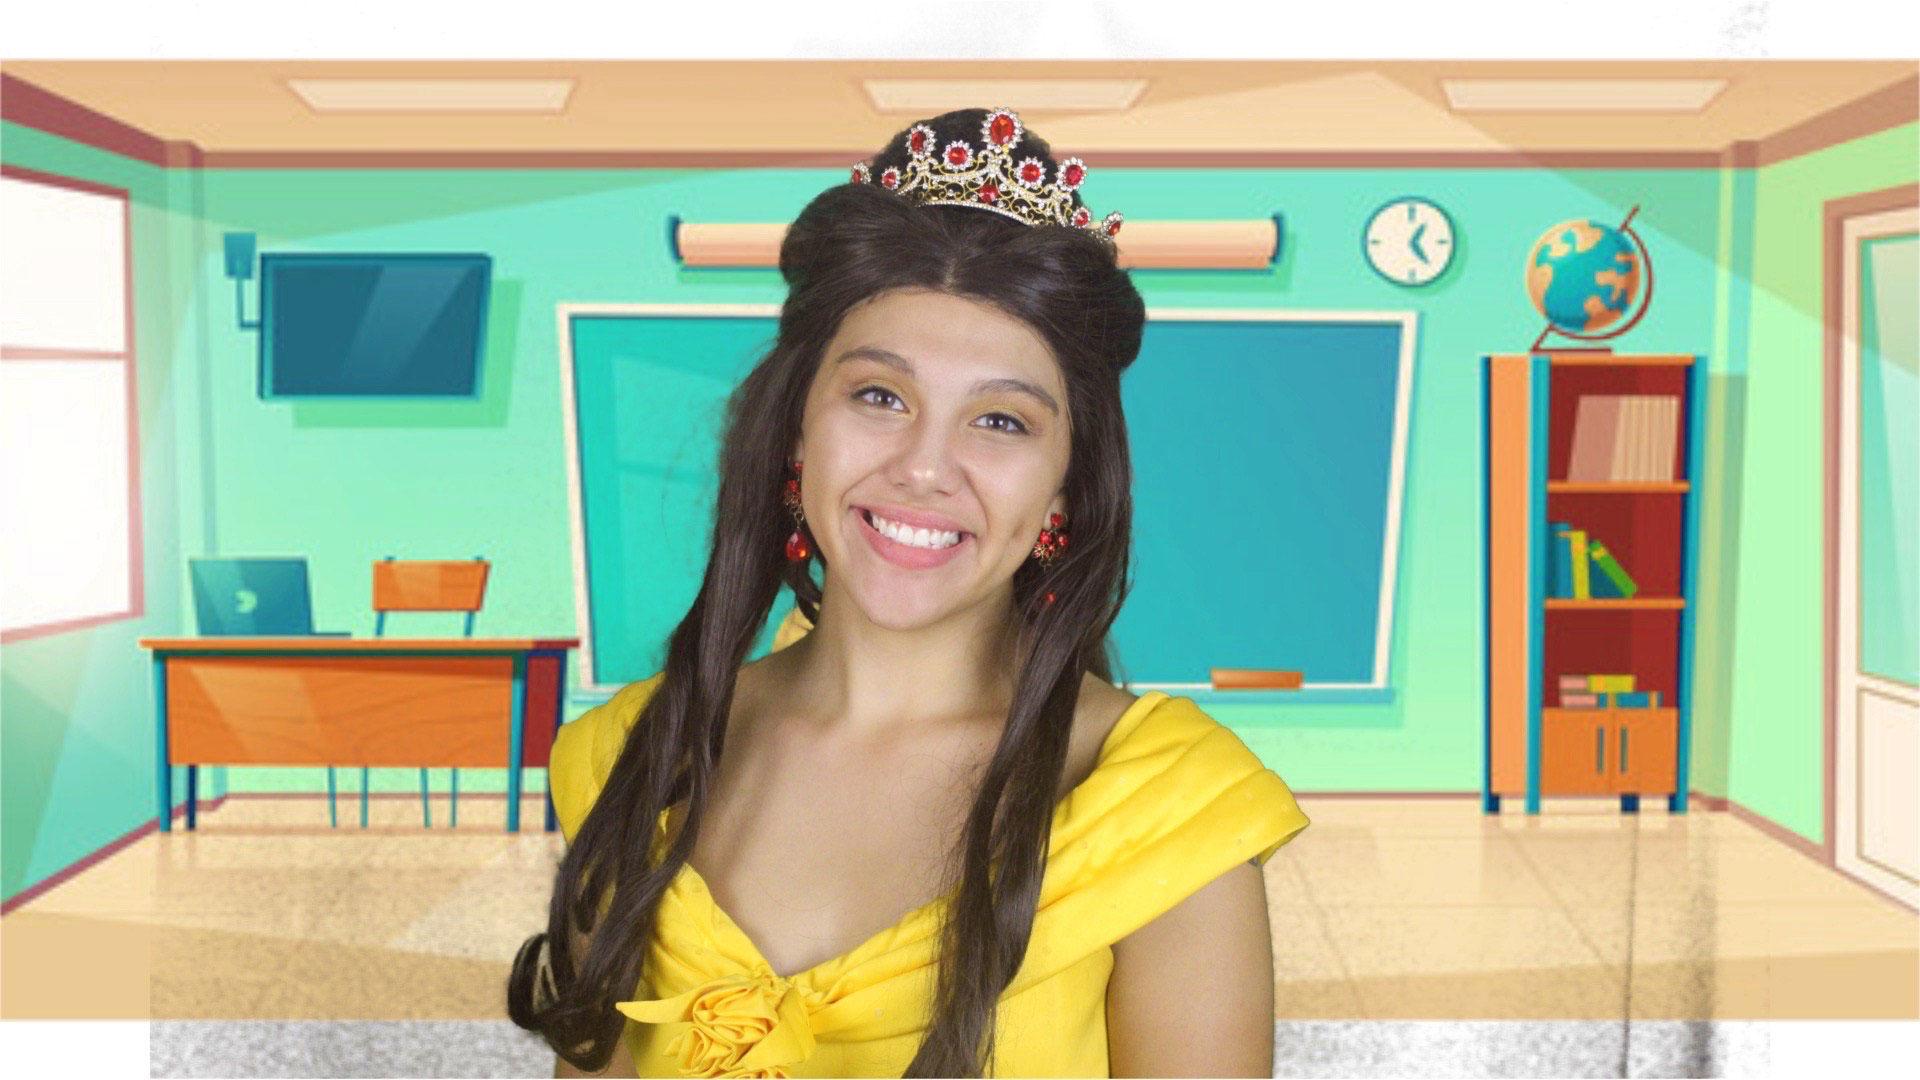 Imagination Reality Announces Princess Tutoring Program